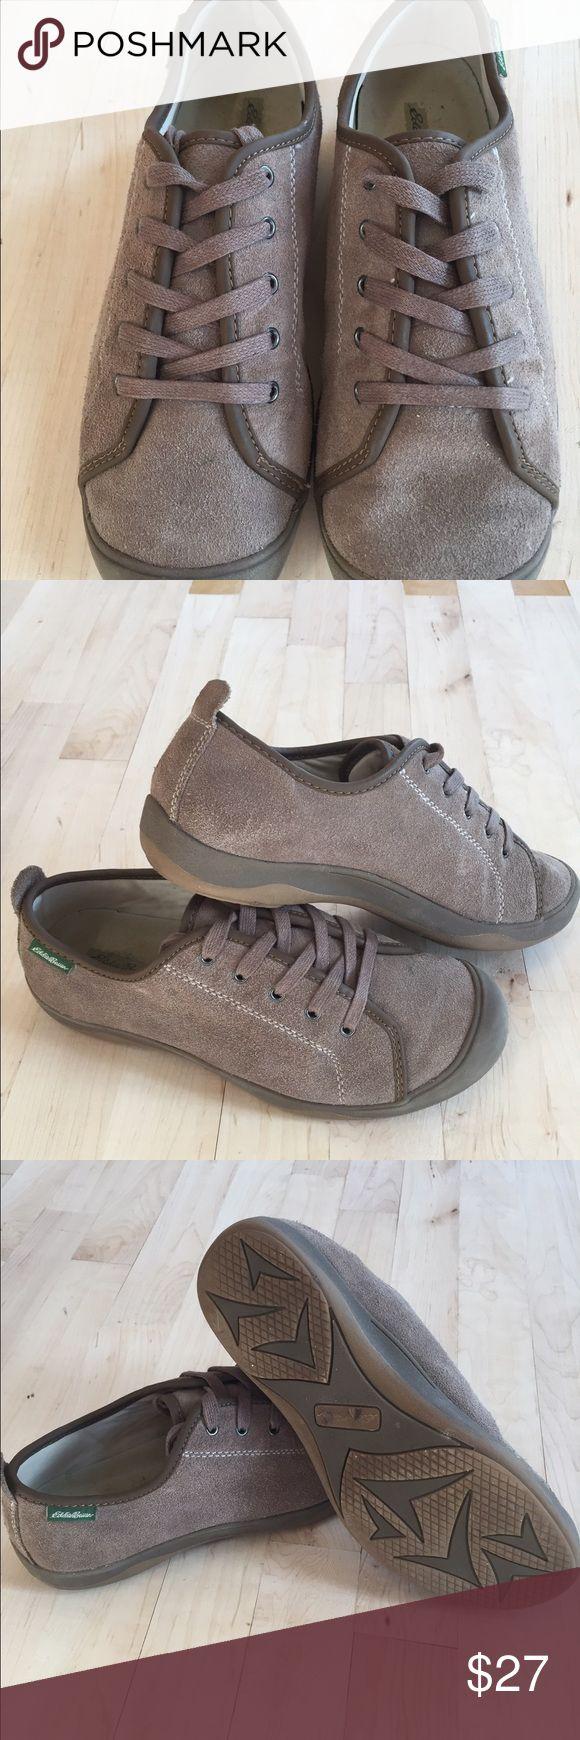 Like New Eddie Bauer leather shoe/sneaker Like New Eddie Bauer leather Shoe/ sneaker size 8 Eddie Bauer Shoes Sneakers